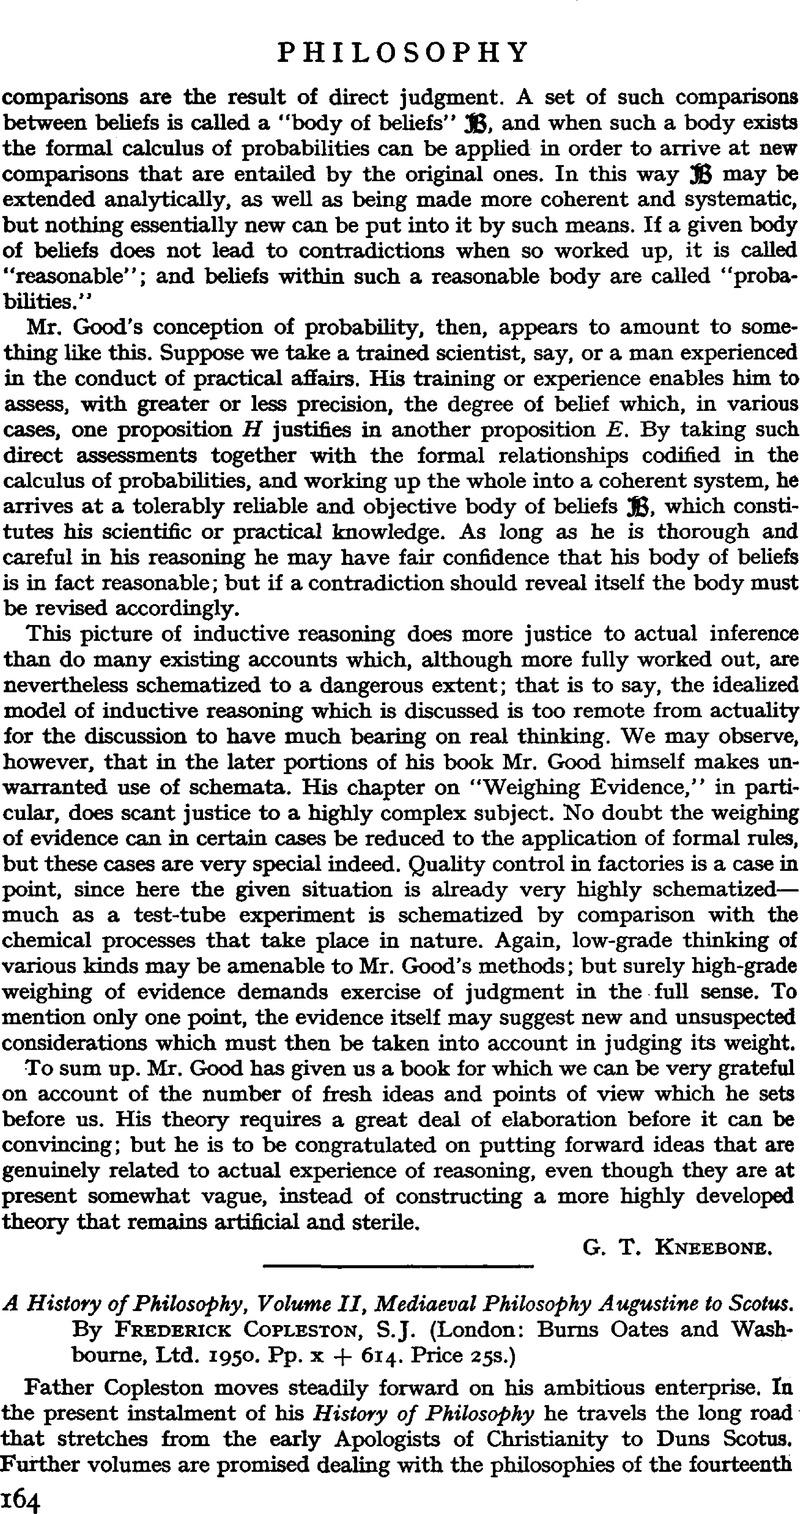 A History Of Philosophy Volume Ii Mediaeval Philosophy Augustine